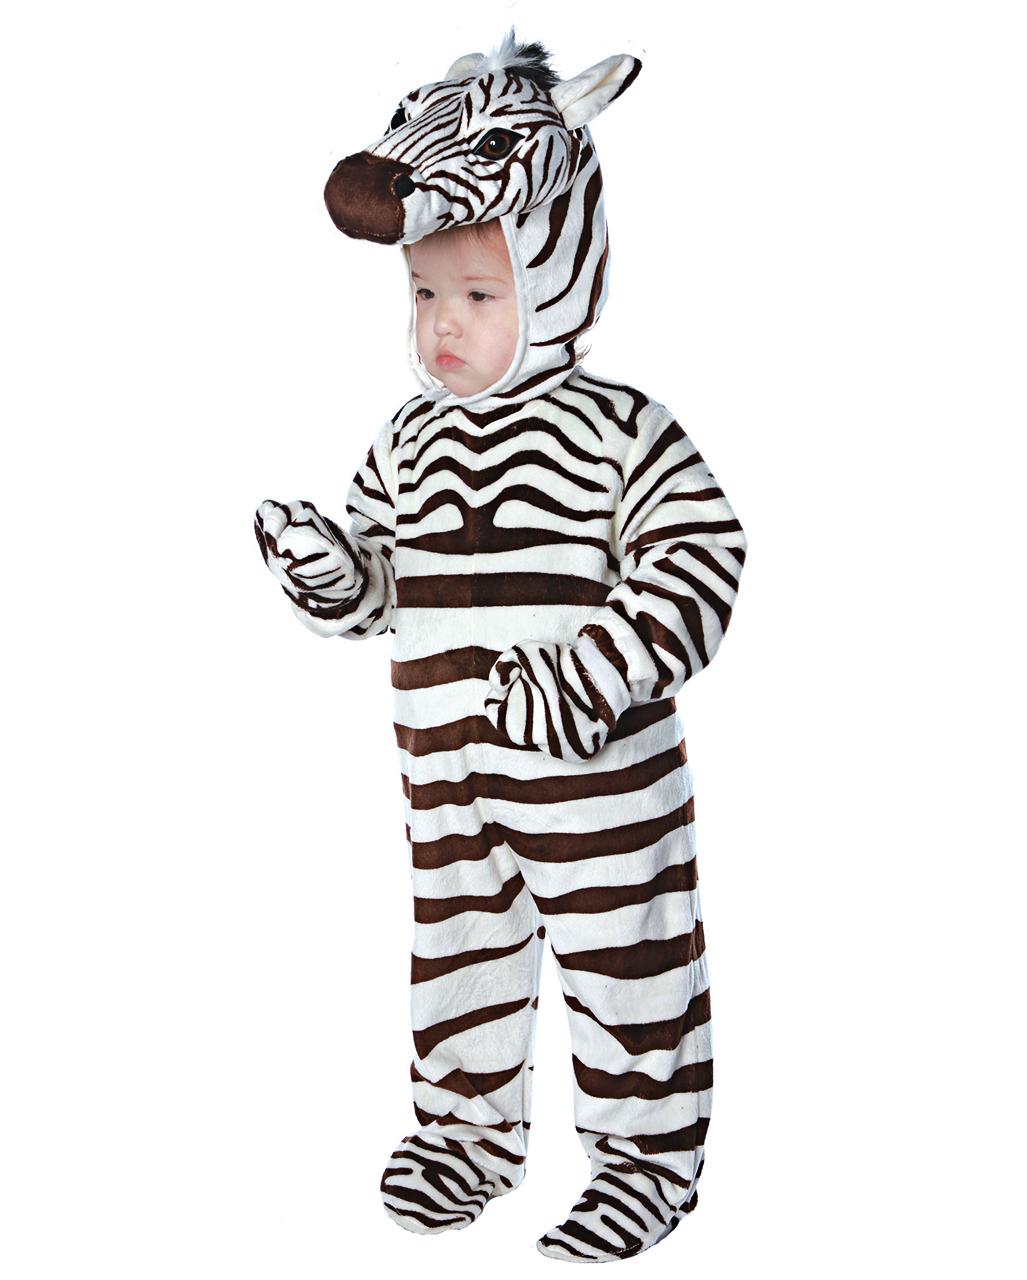 Zebra Kleinkinderkostum Fur Fasching Horror Shop Com